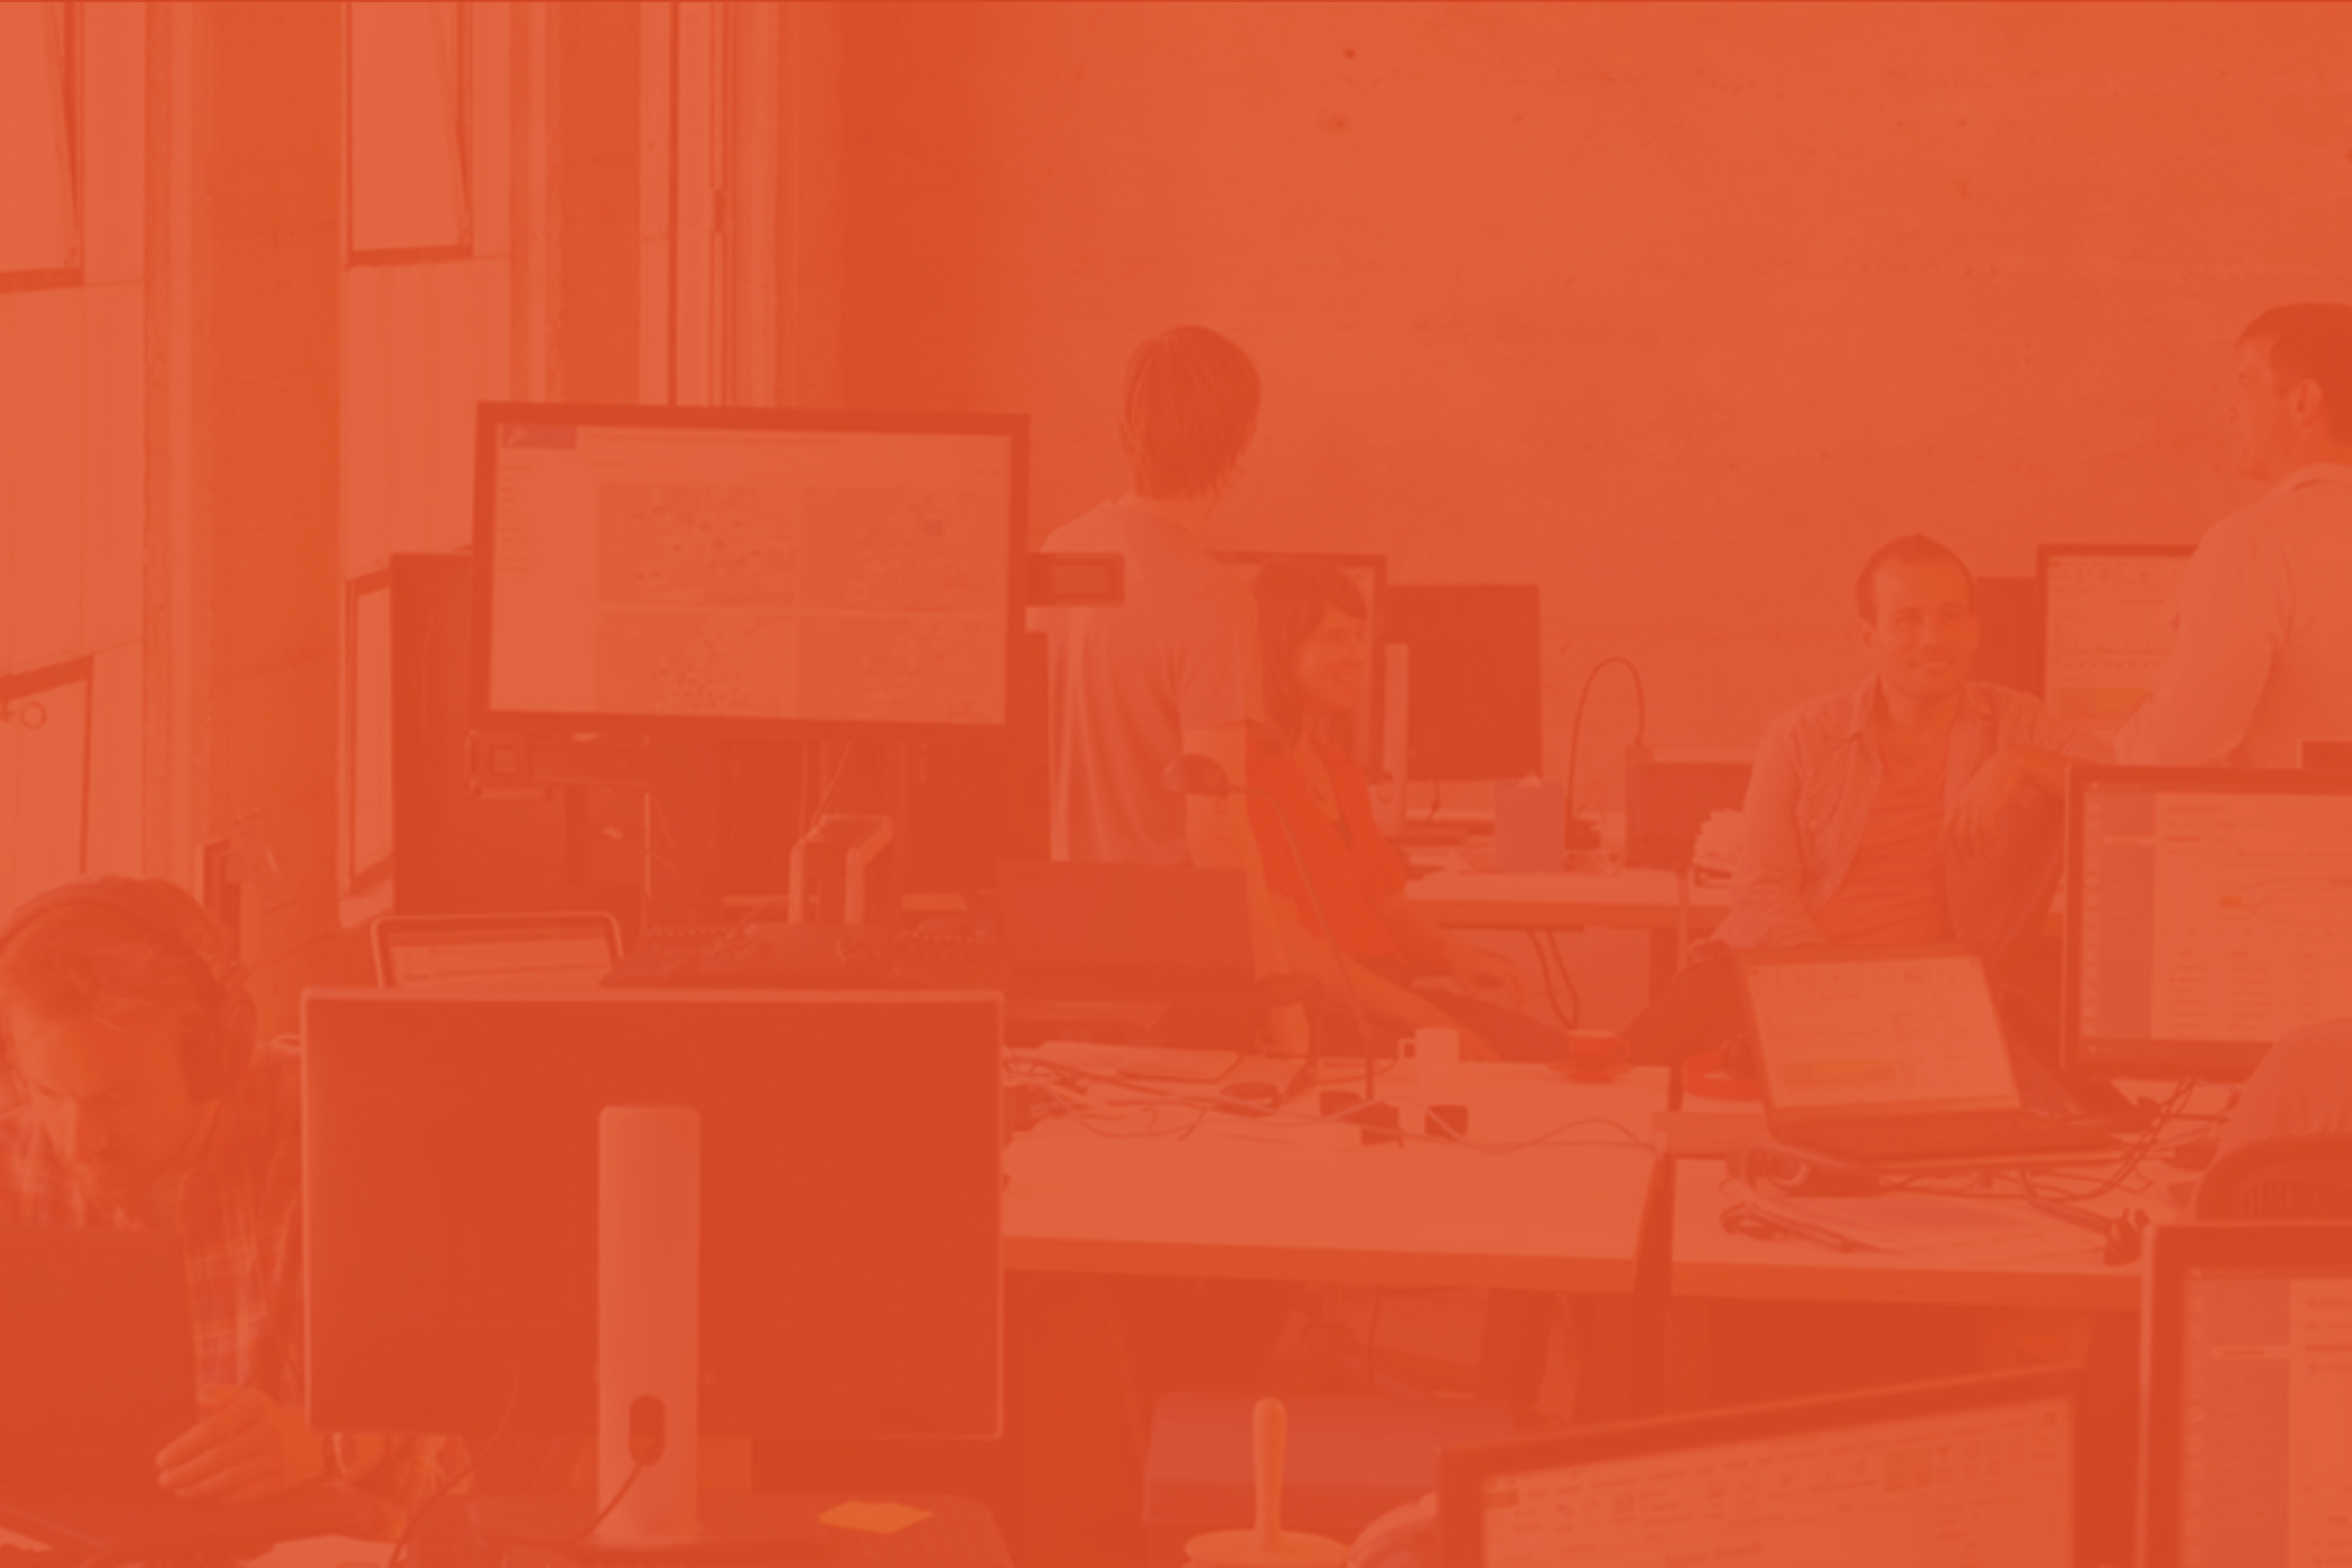 Microsoft Office 365 for Business & Enterprise